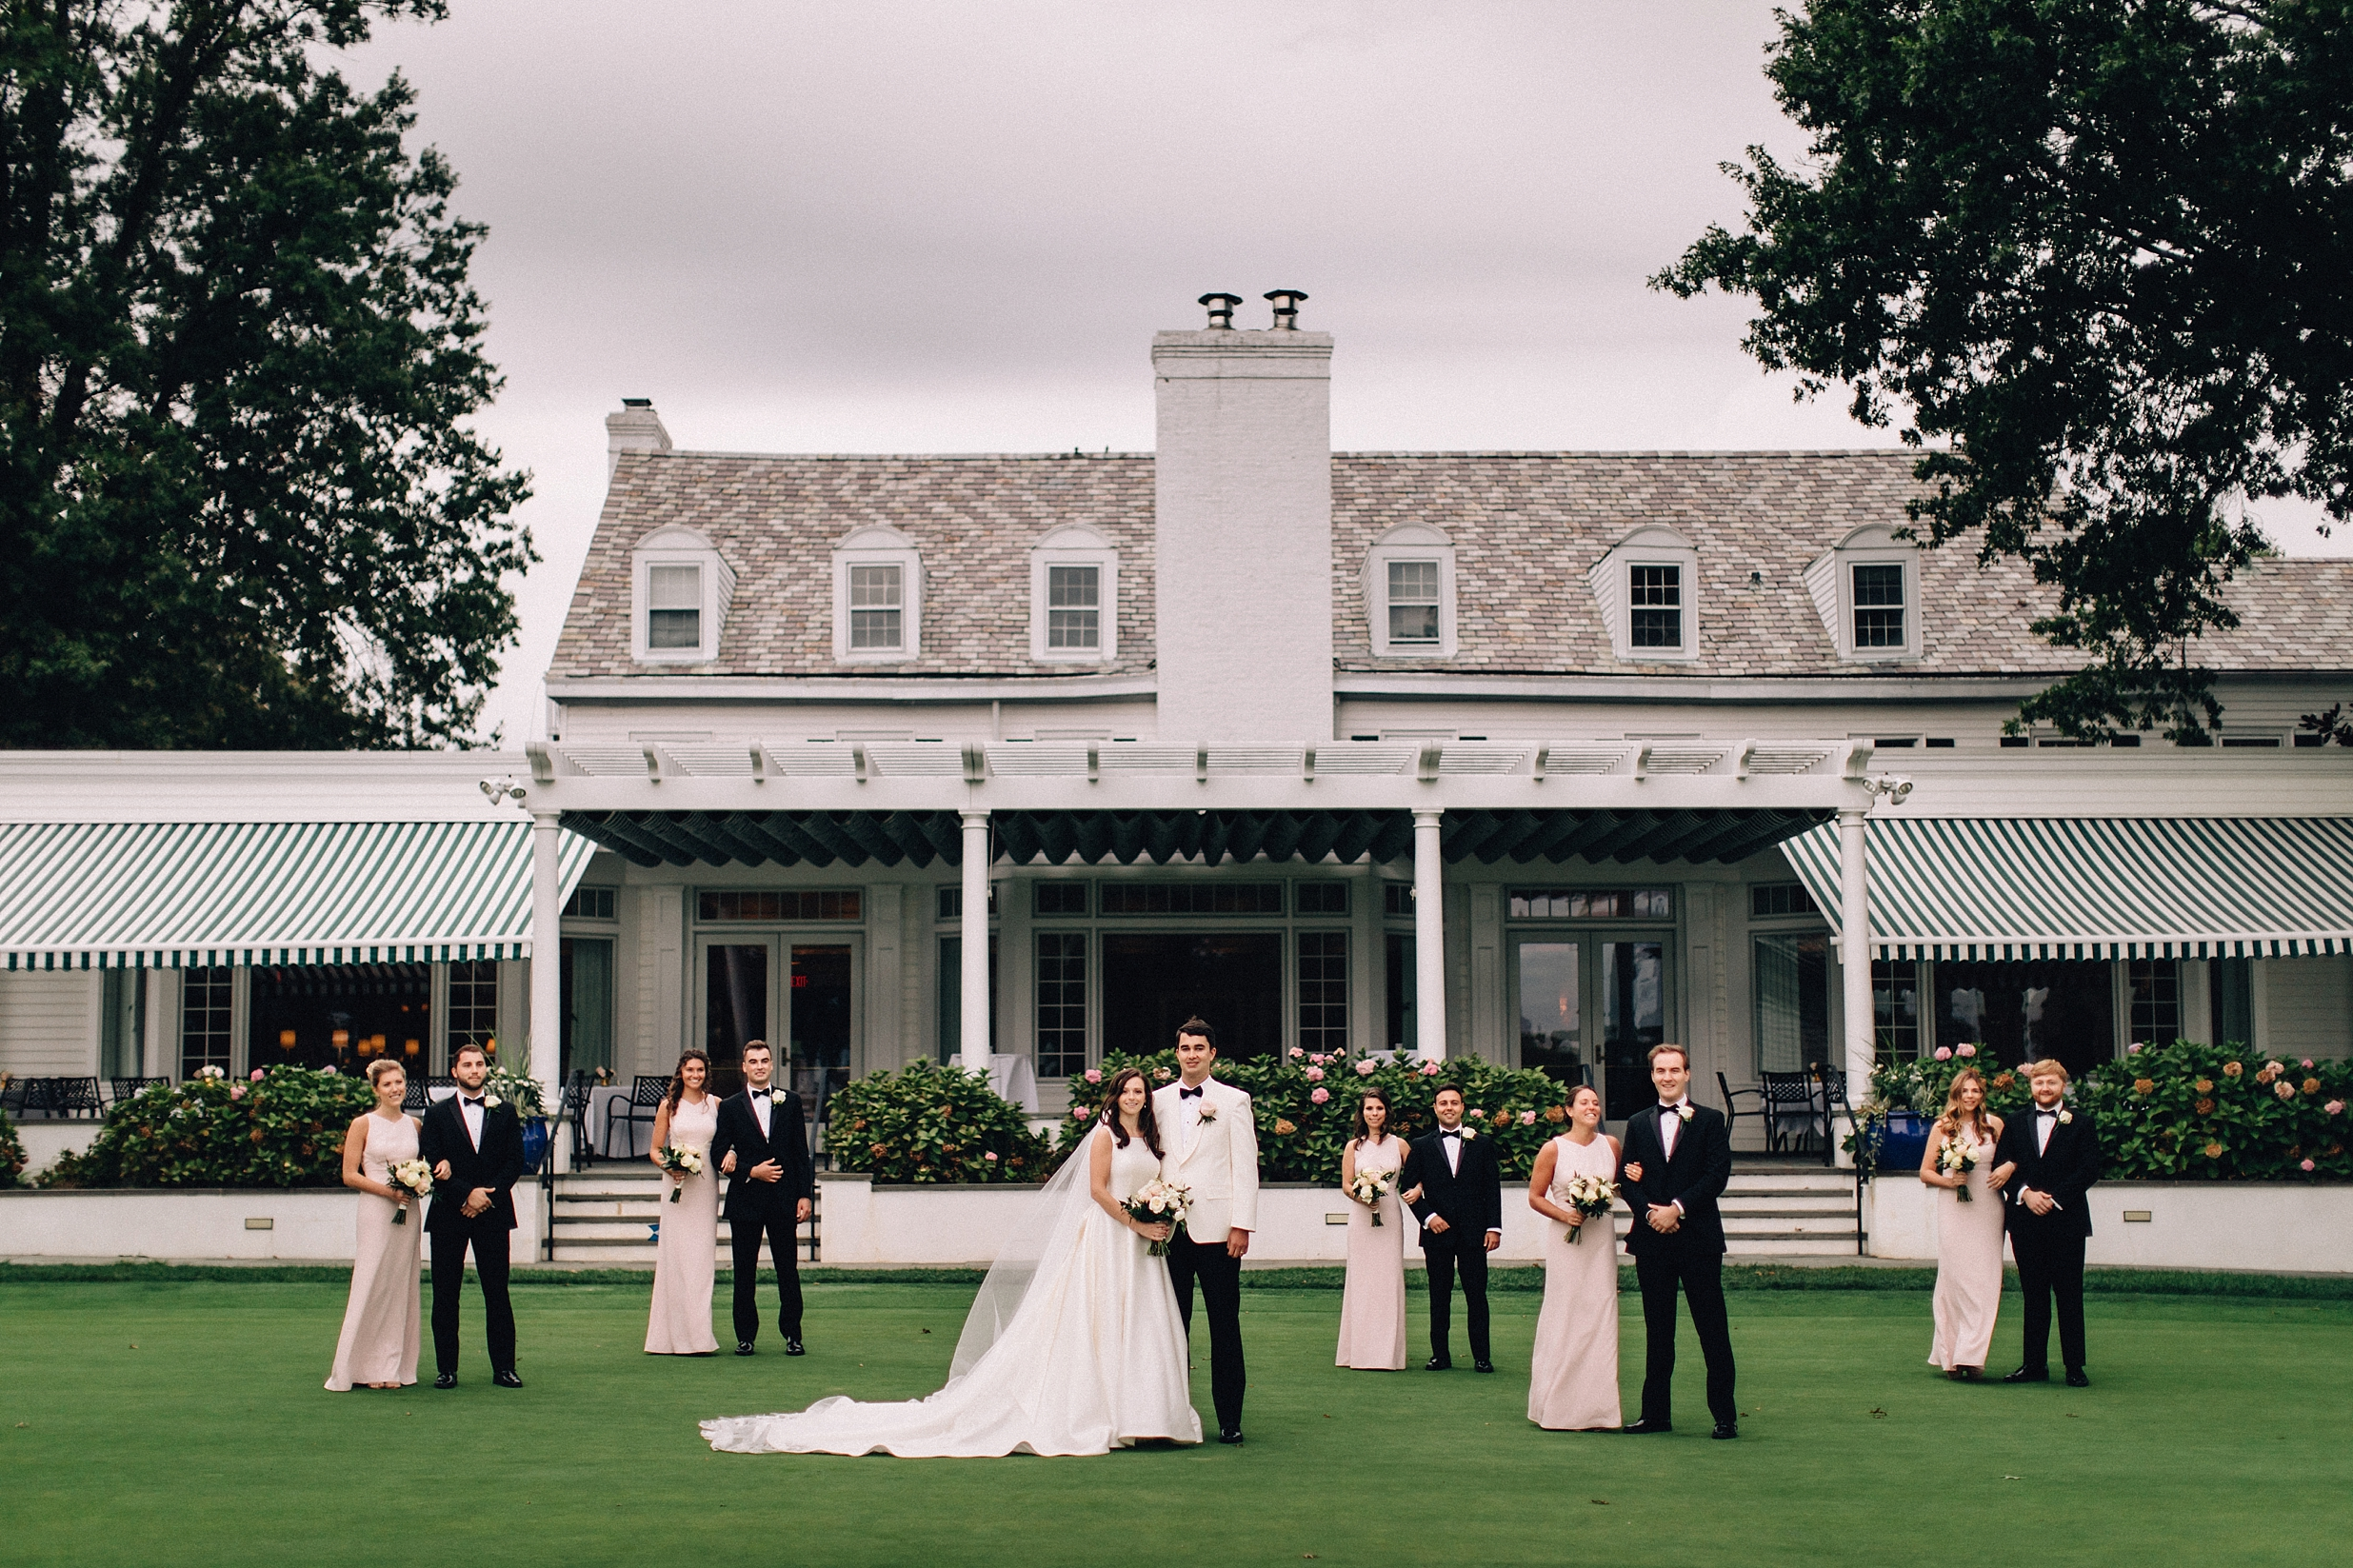 rumson-tented-wedding-nj-maine-conneticut-classic_0034.jpg